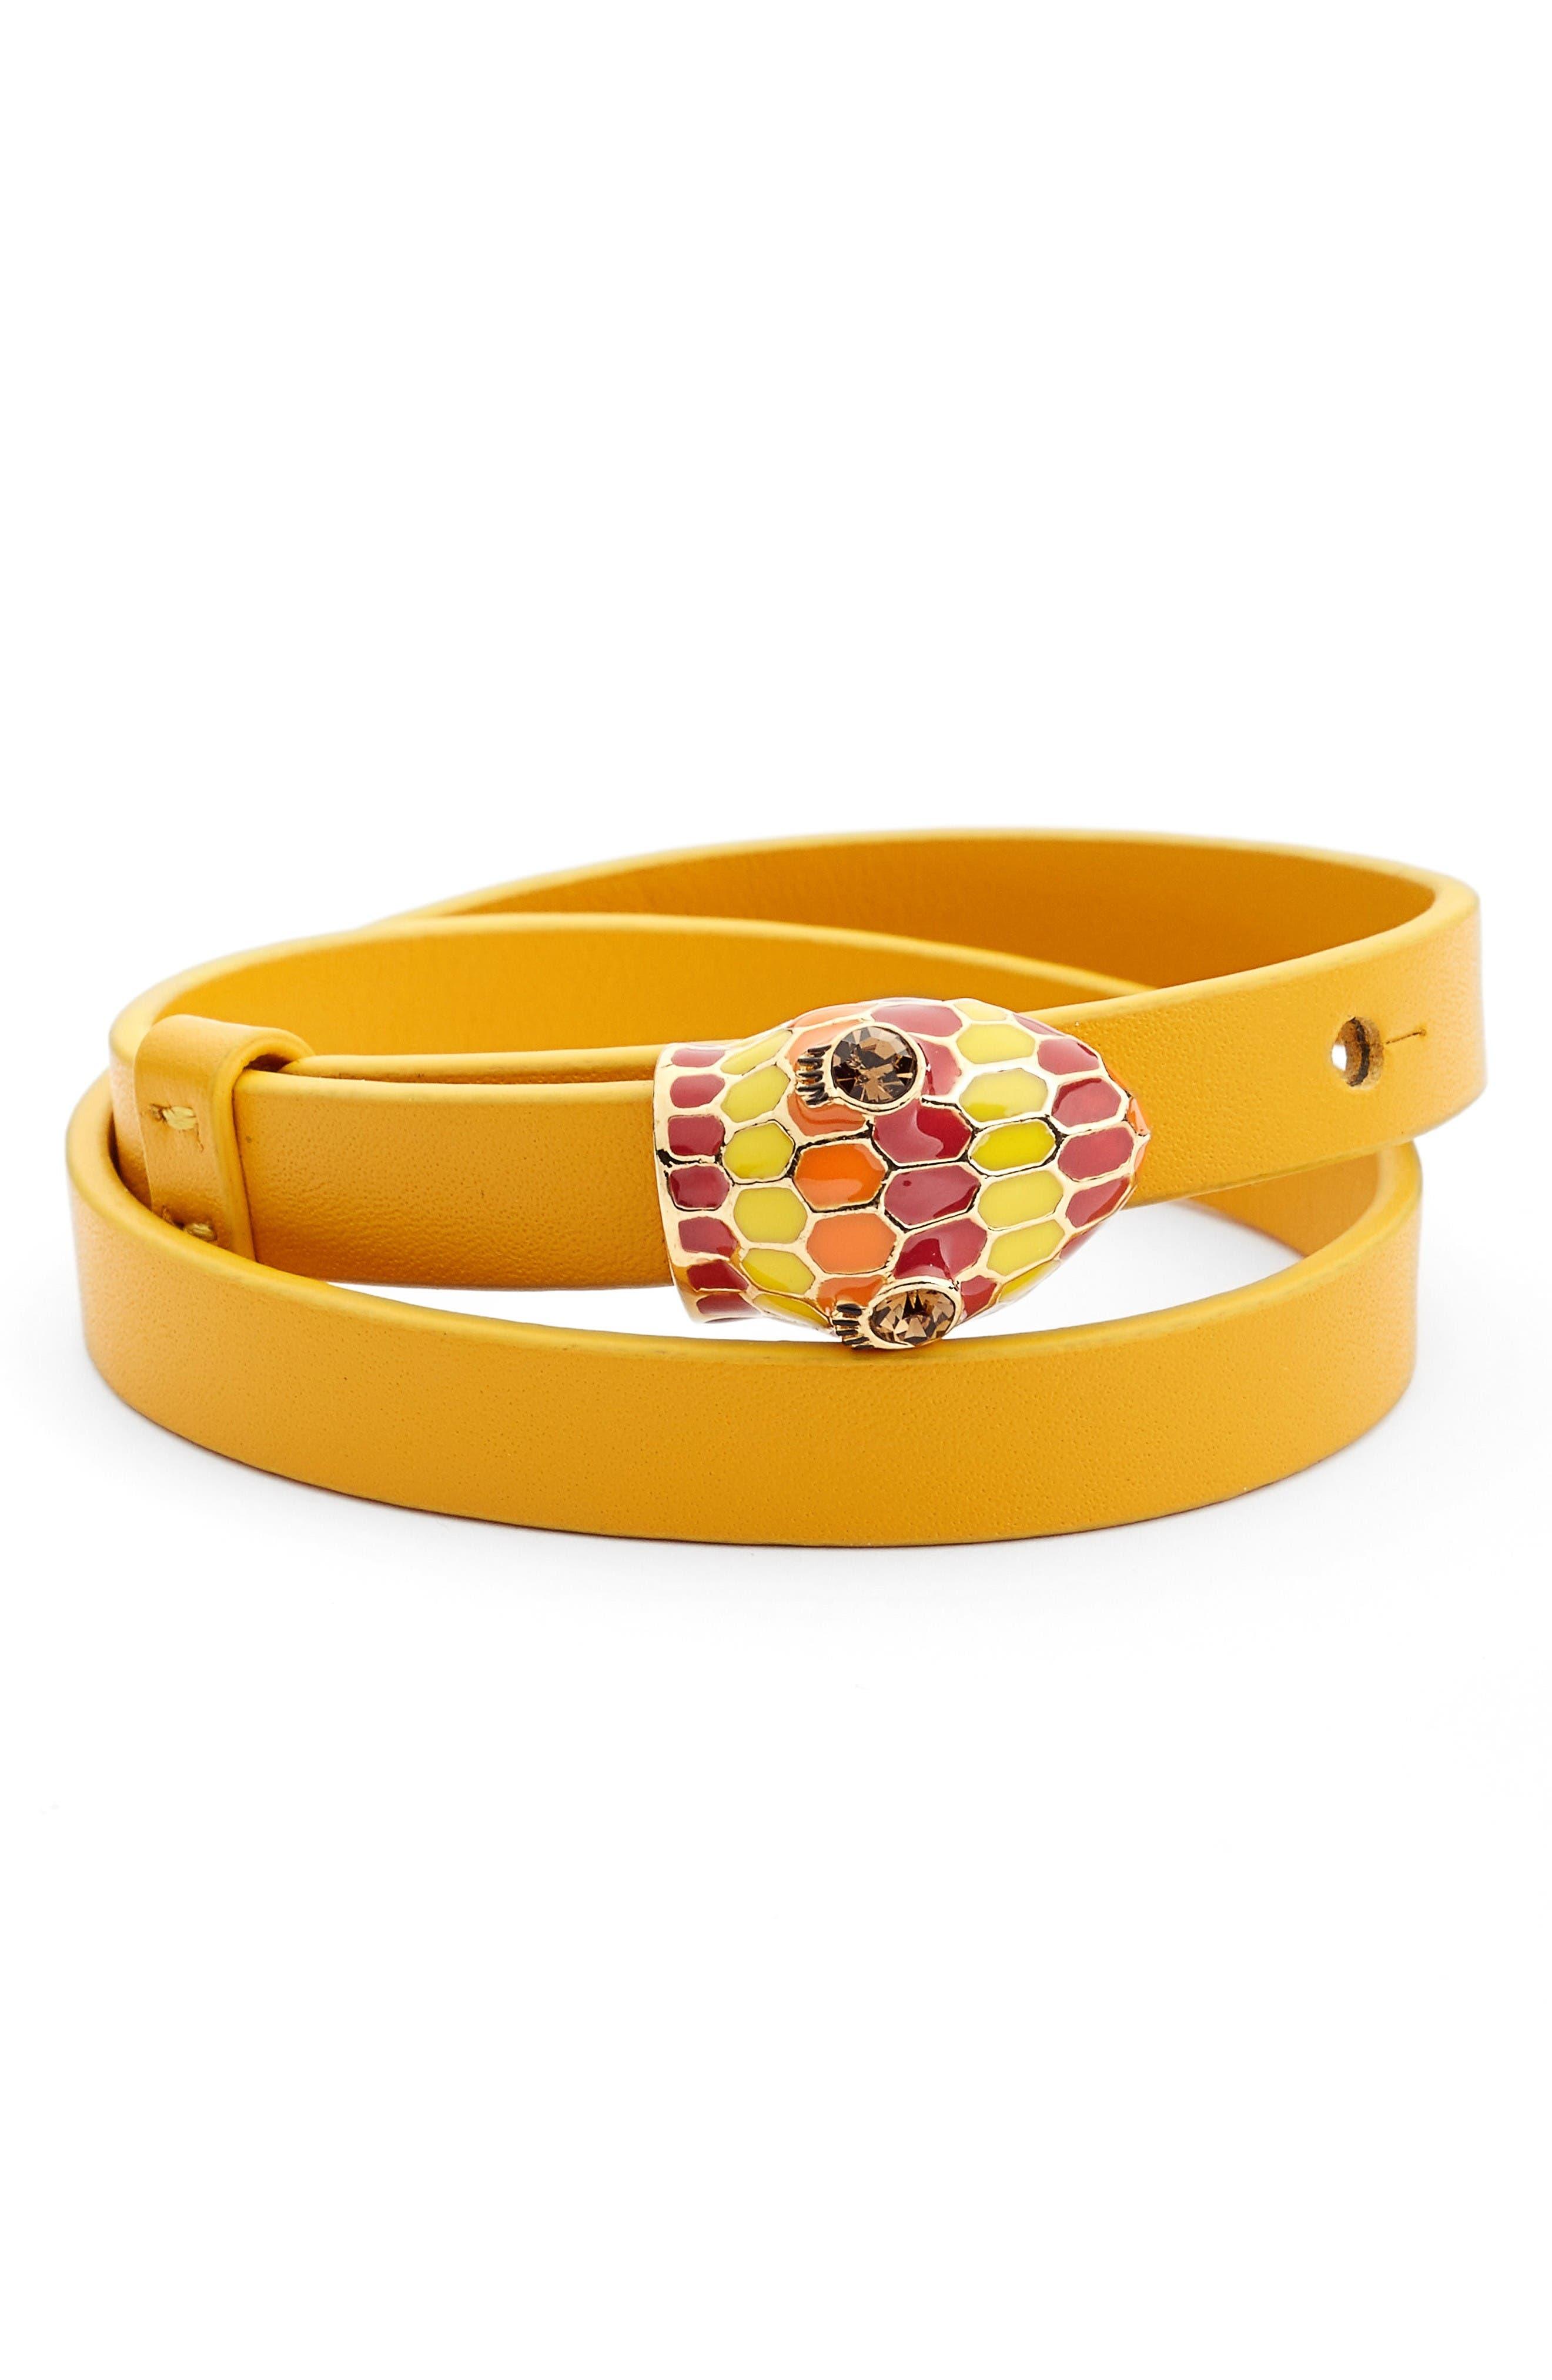 Main Image - kate spade new york spice things up wrap bracelet